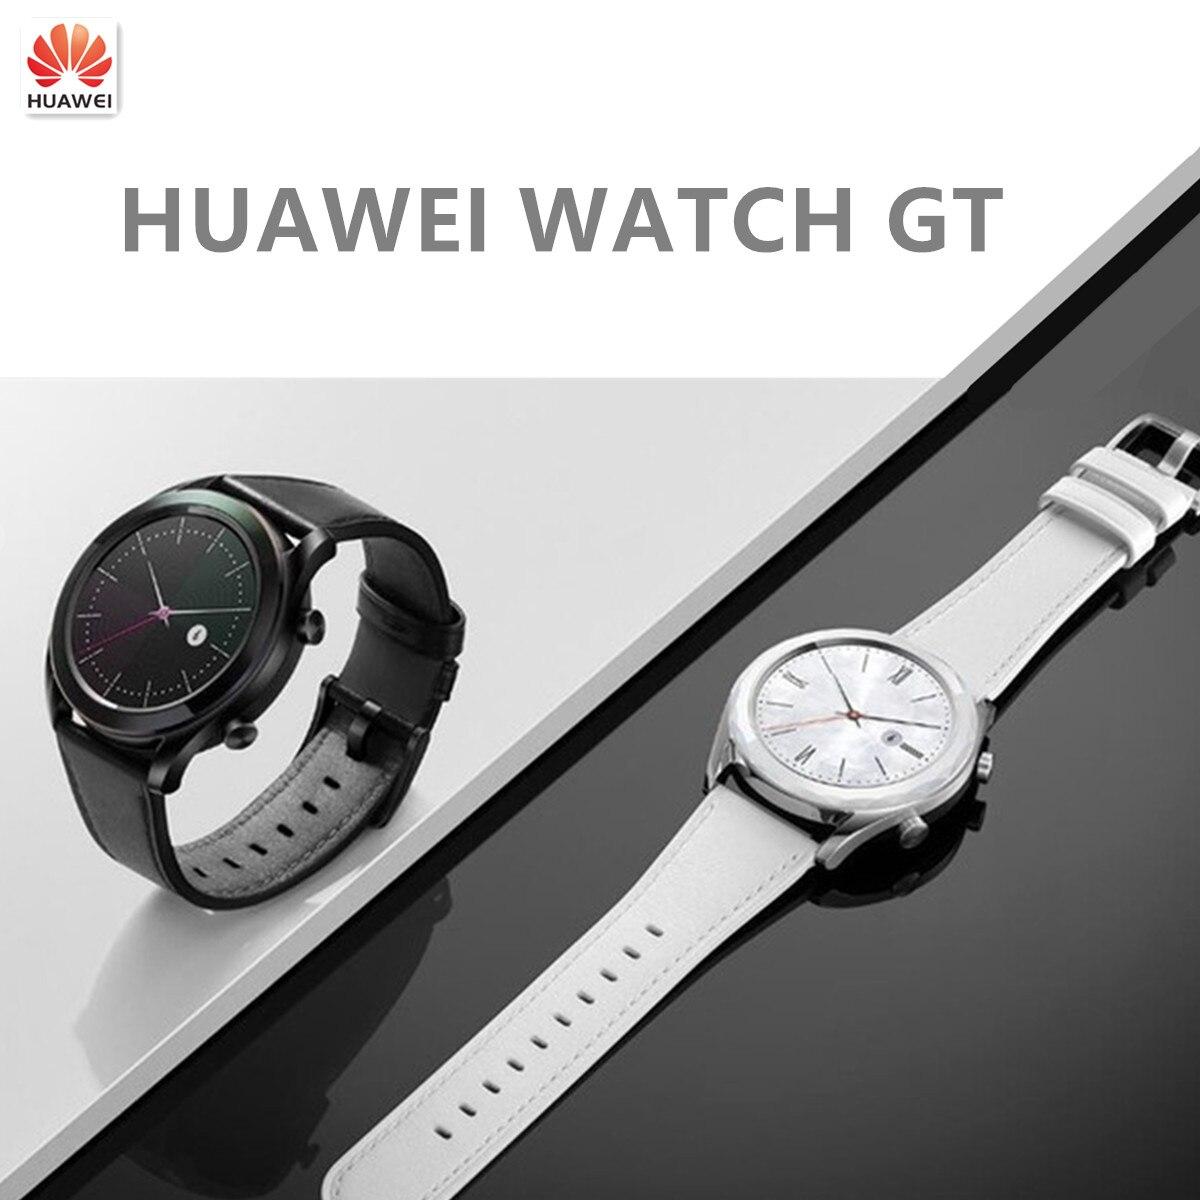 Original 95% NEW HUAWEI Watch GT Smart GPS Sport TrackerWatch Sleep Support Waterproof Heart Rate Tracker  SmartWatch